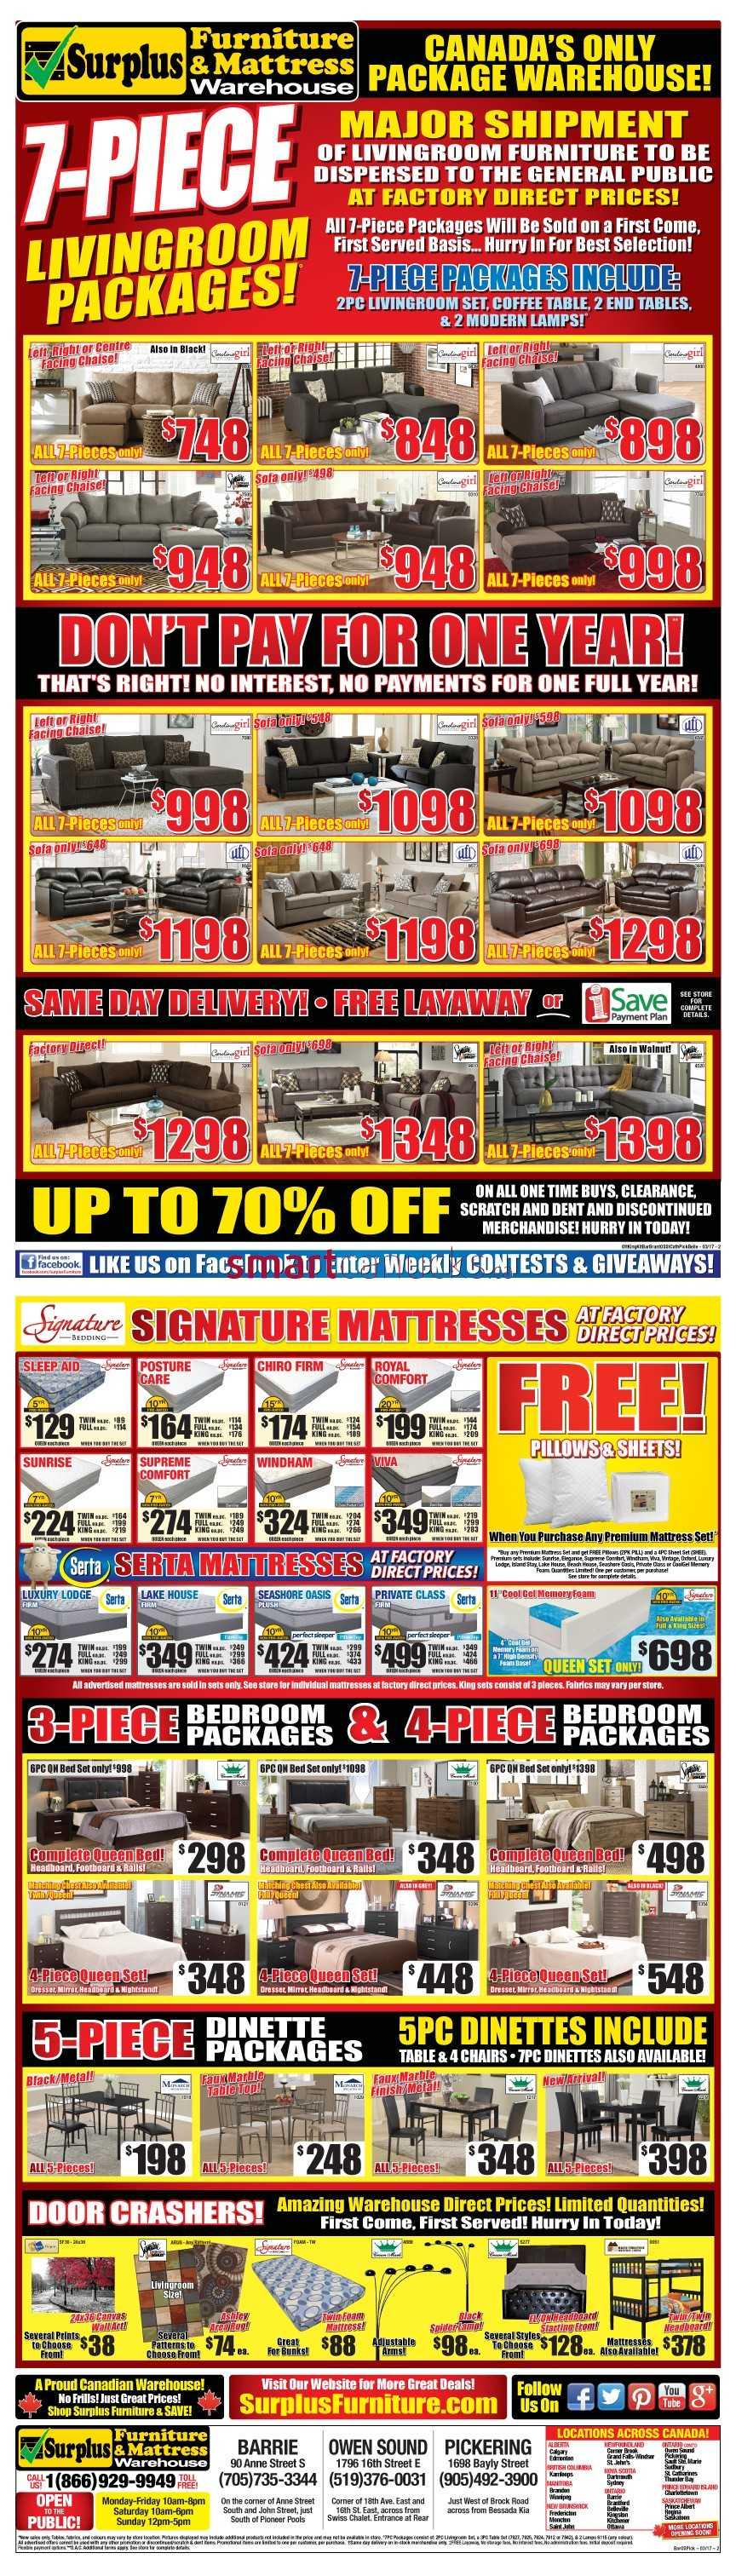 Surplus Furniture Mattress Warehouse Barrie Flyer March 7 To 20